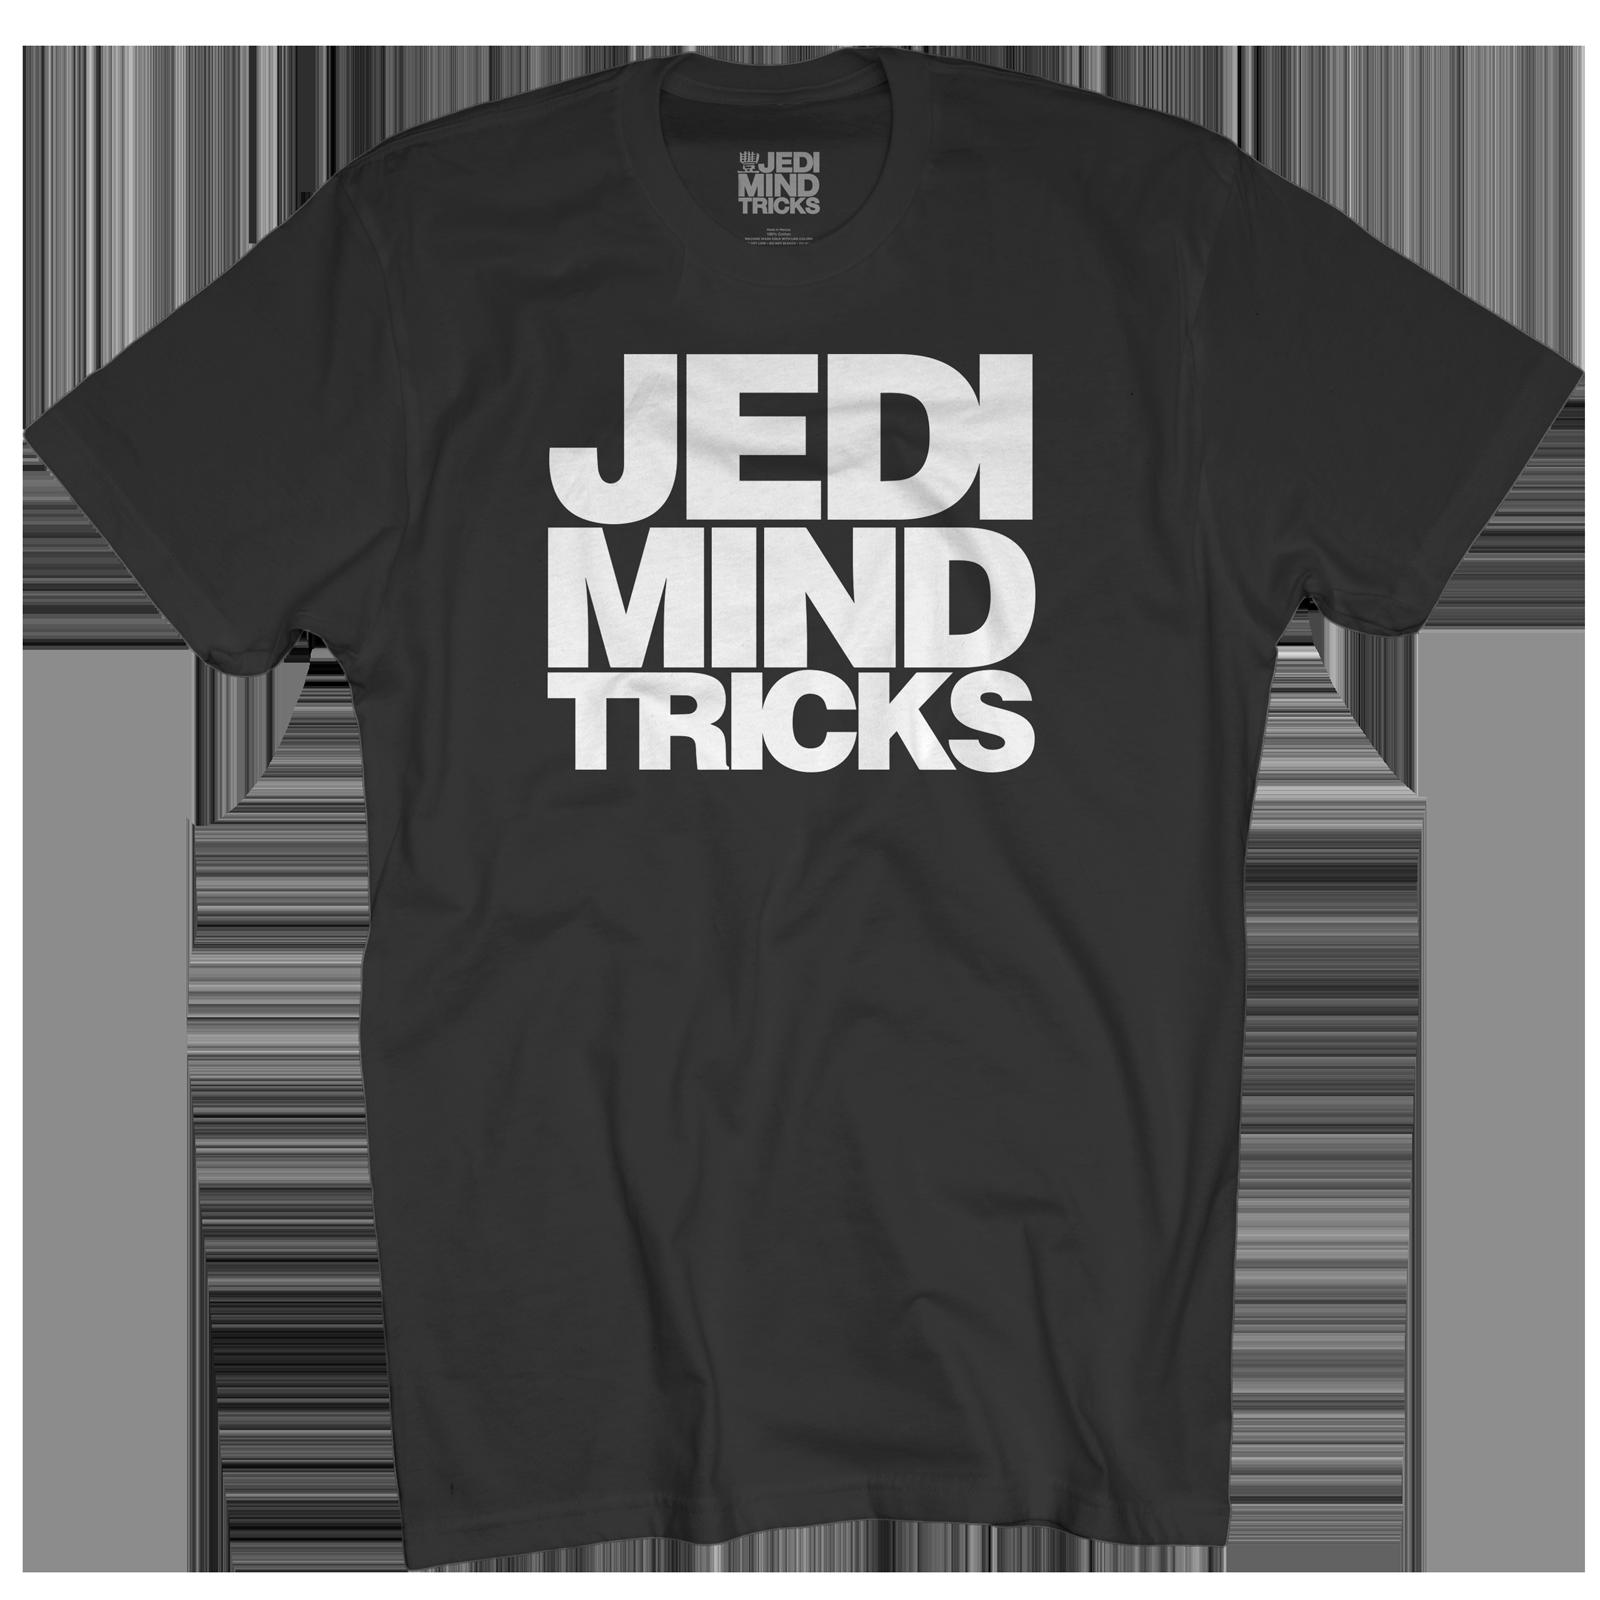 JMT Stacked Logo on Black T-Shirt